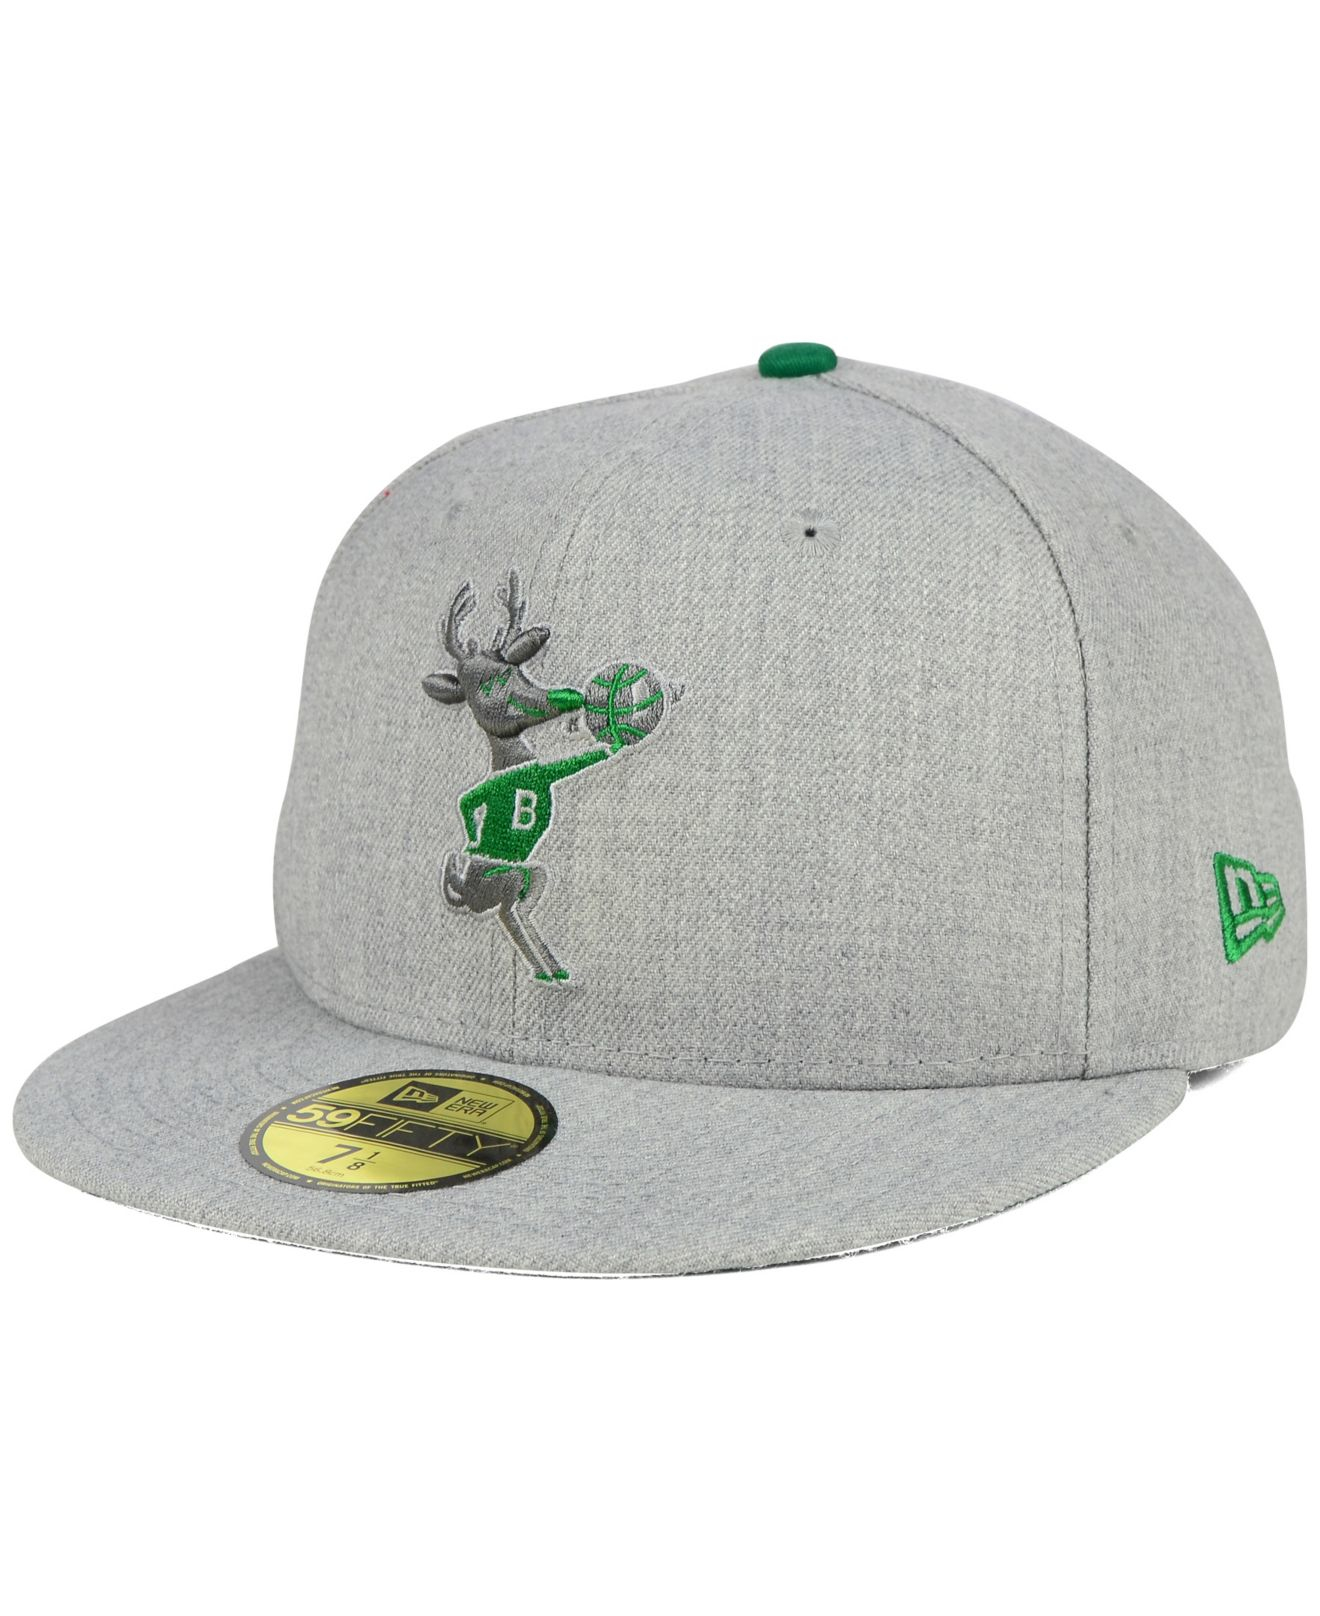 size 40 a0698 2aef2 Lyst - KTZ Milwaukee Bucks Heather League Basic 59fifty Cap in Gray ...